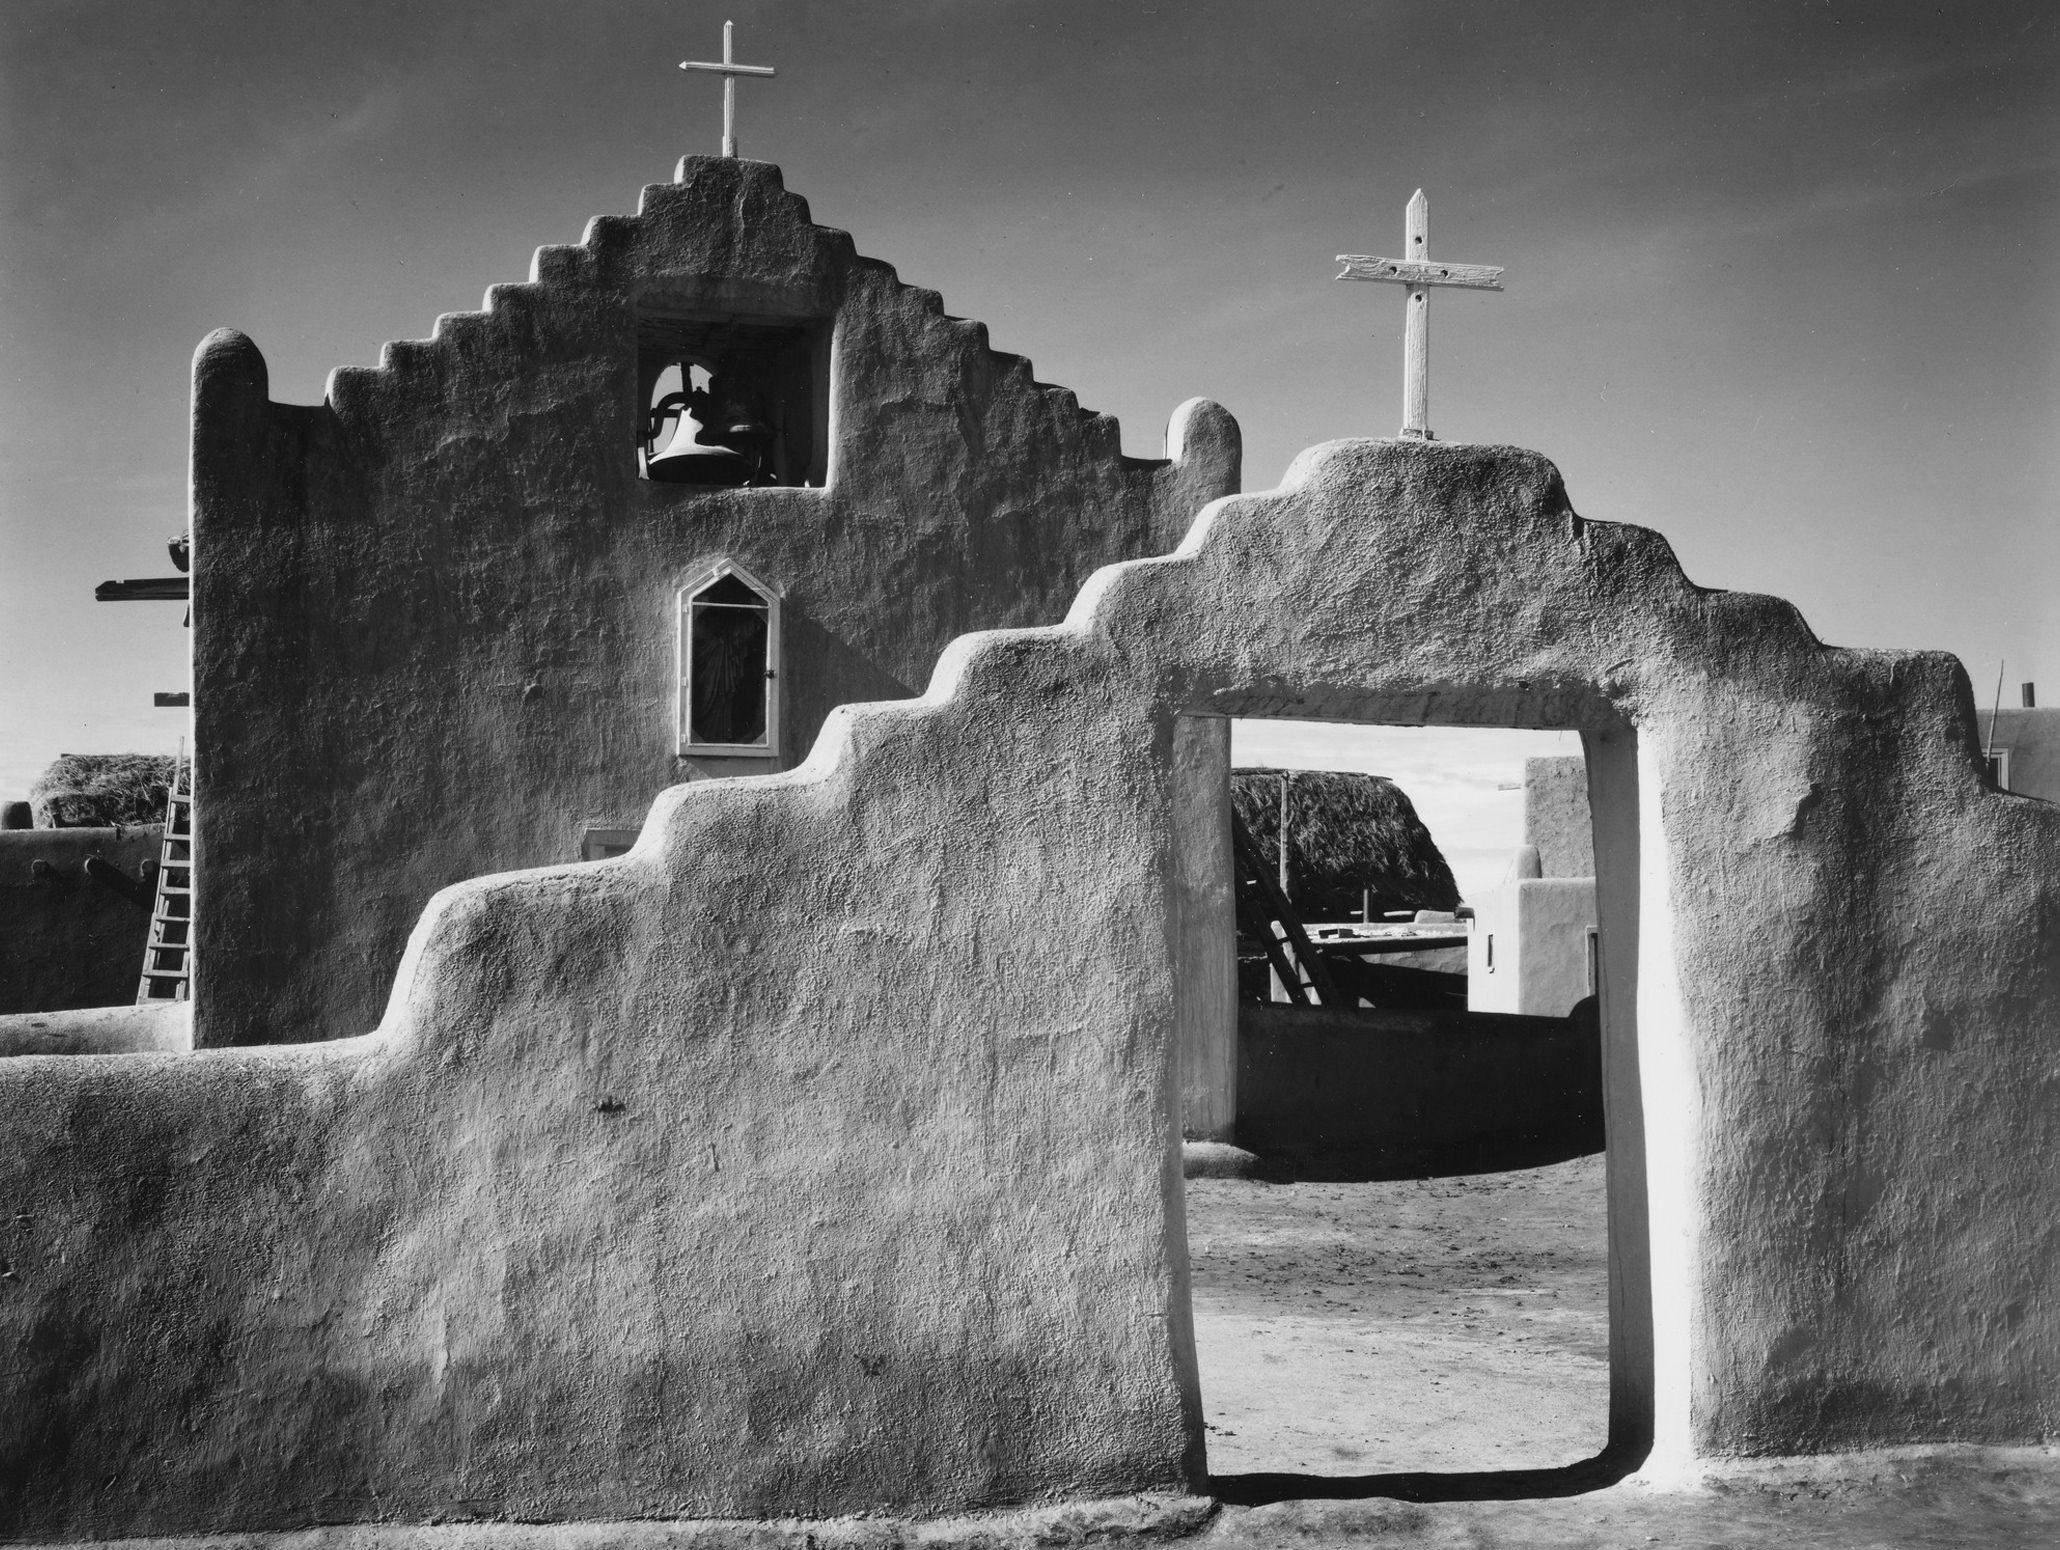 Ansel Adams New Church Taos Pueblo New Mexico v1929